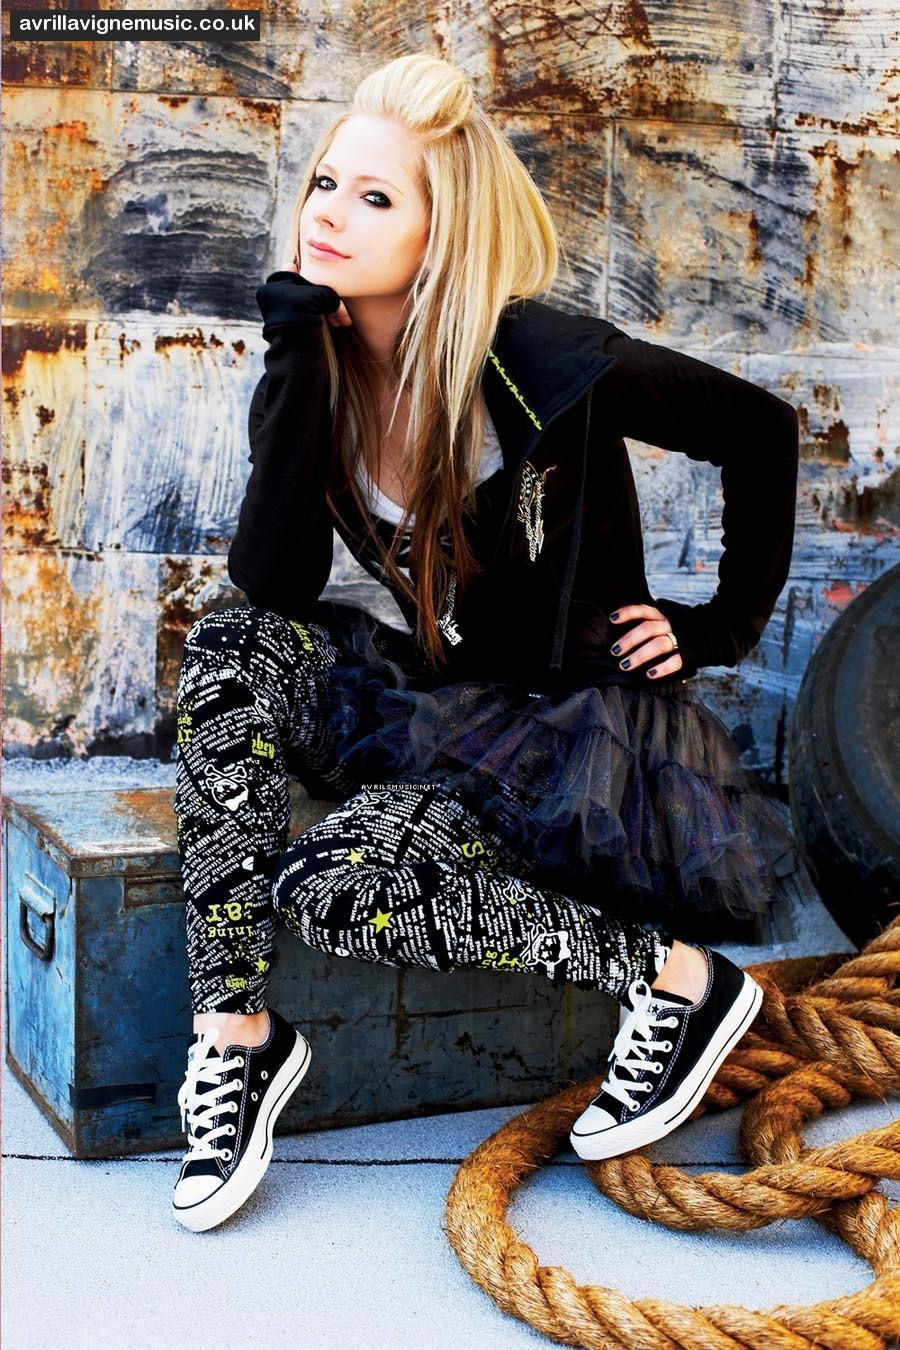 Avril Lavigne Clothing Line